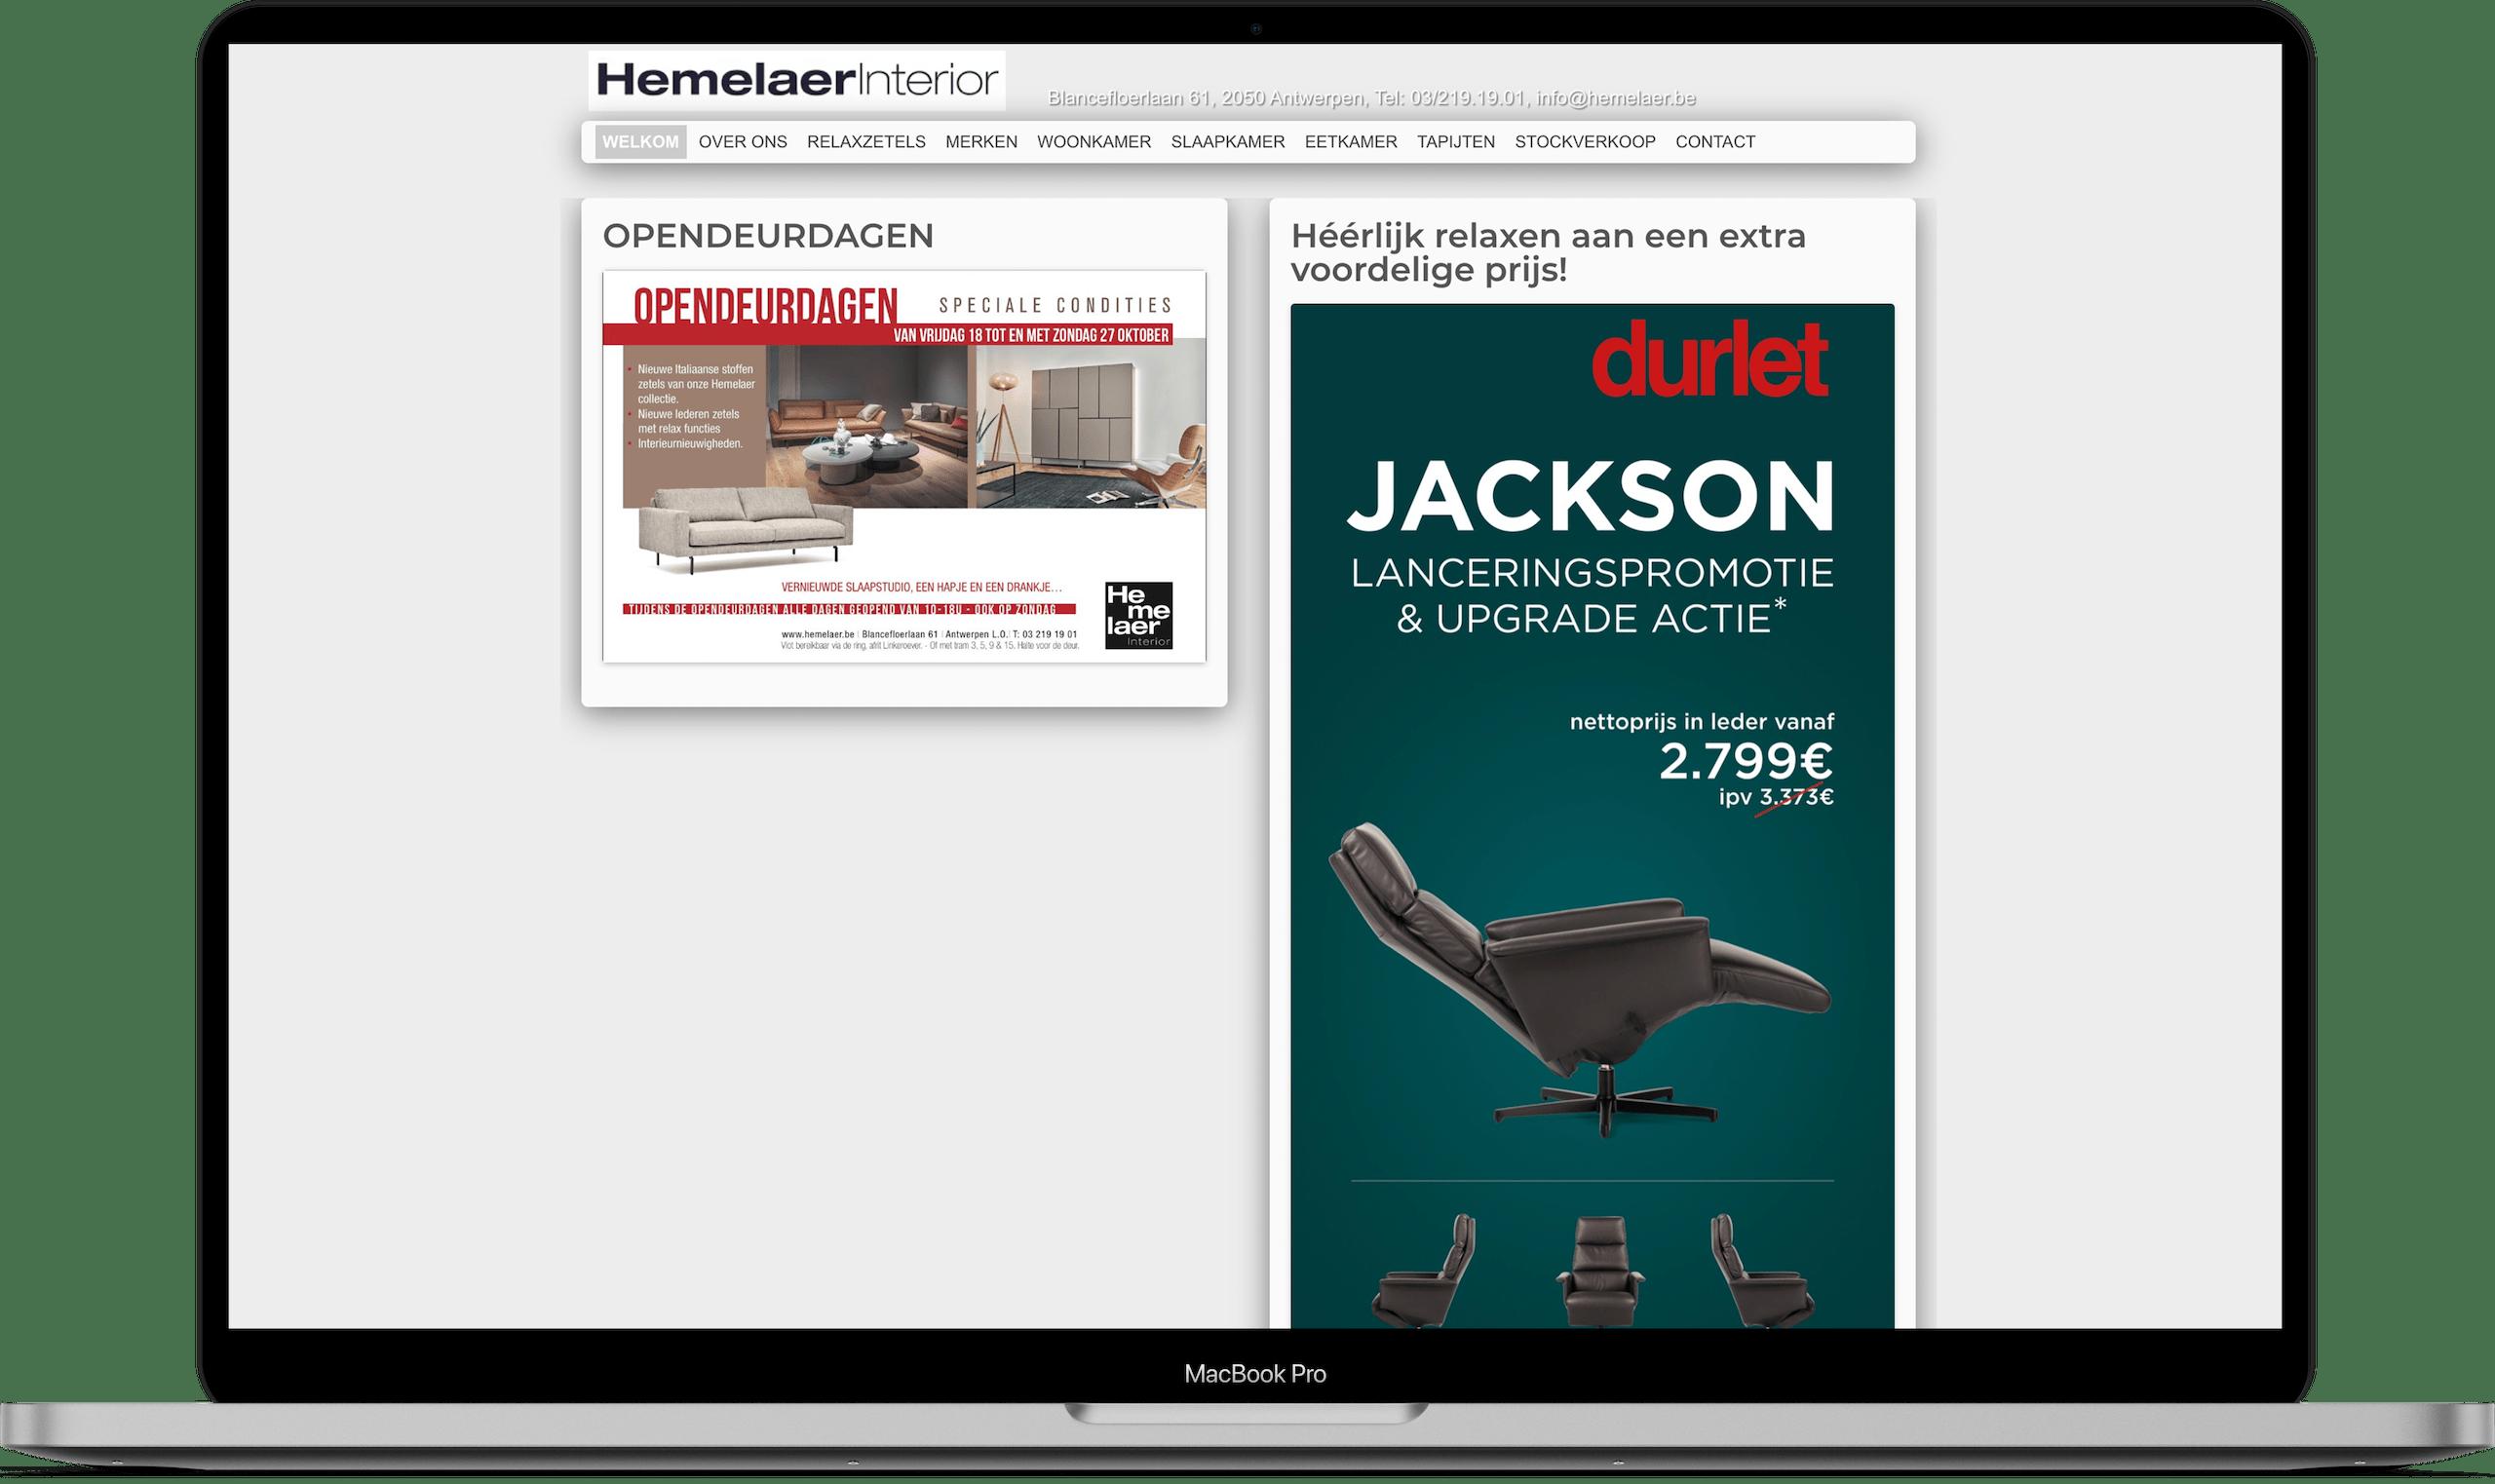 Larkom Webdesign in Londerzeel Hemelaer Interior website portfolio 0014